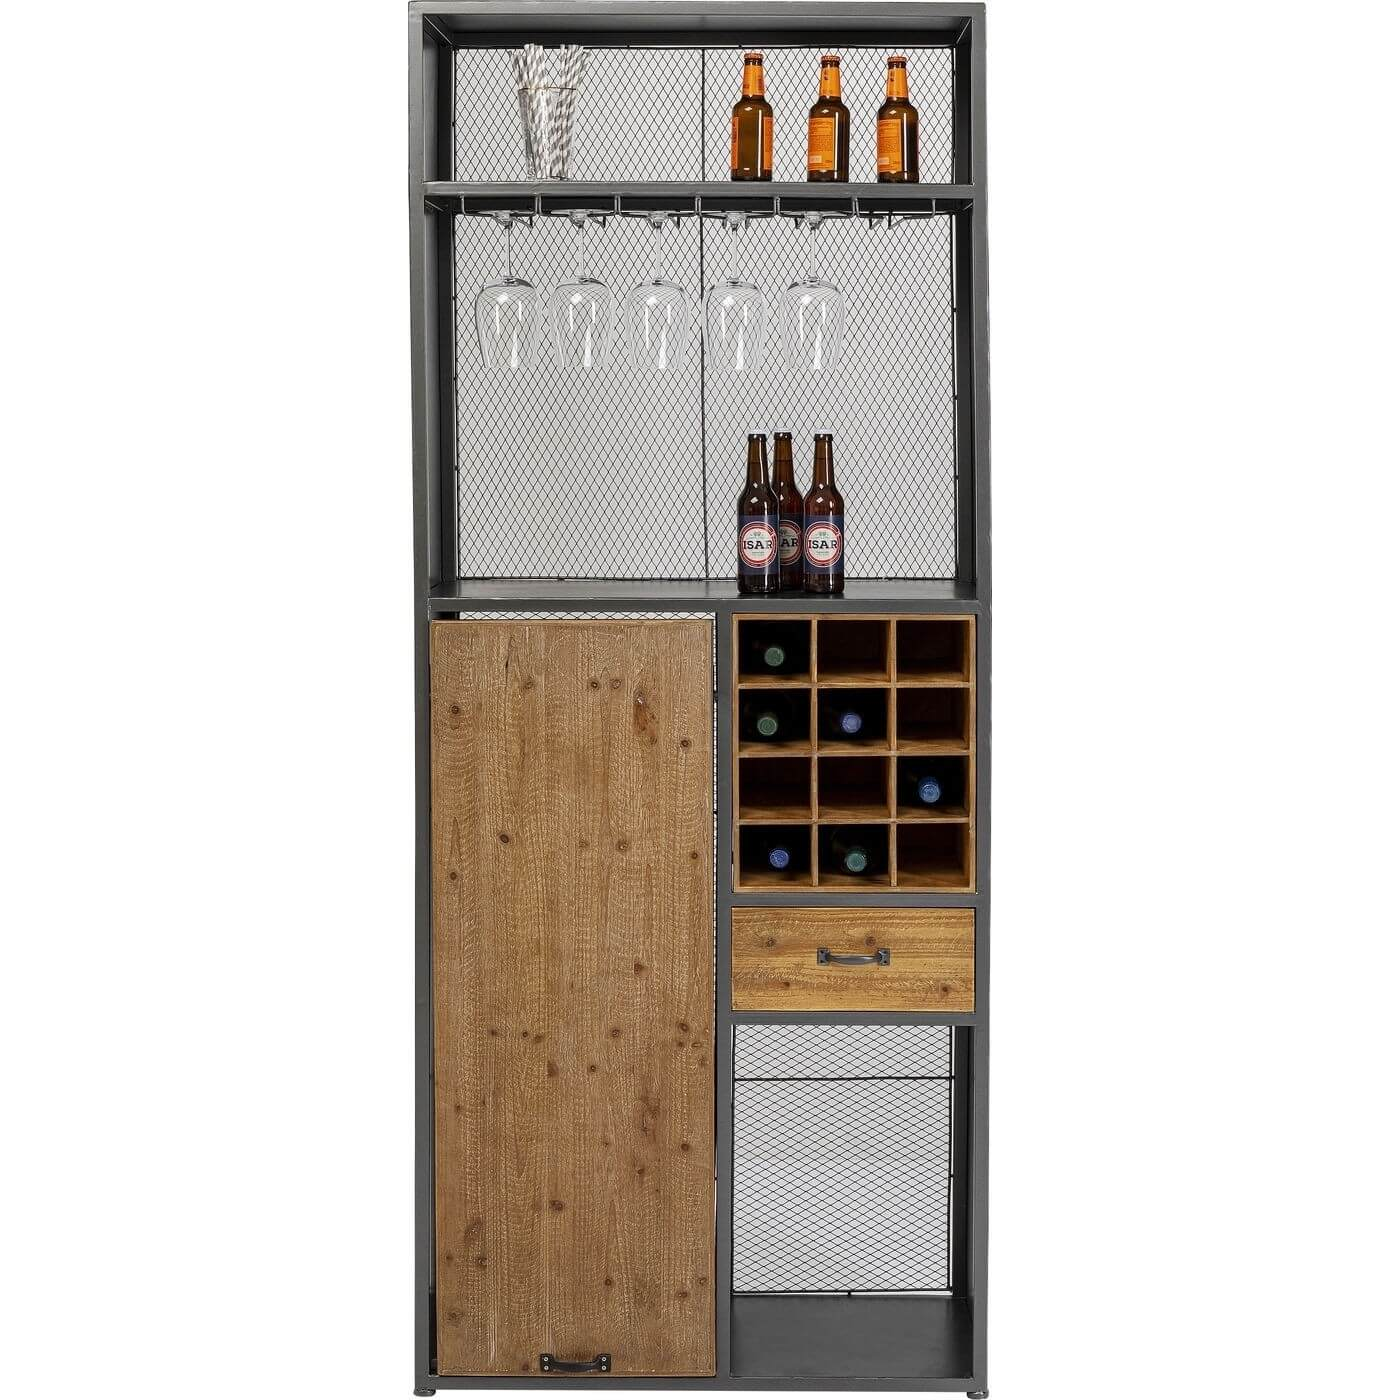 kare design – Kare design vinoteca barreol, m. bord, 3 hylder, skuffe, holder til glas mm. - stål og massivt gran på boboonline.dk